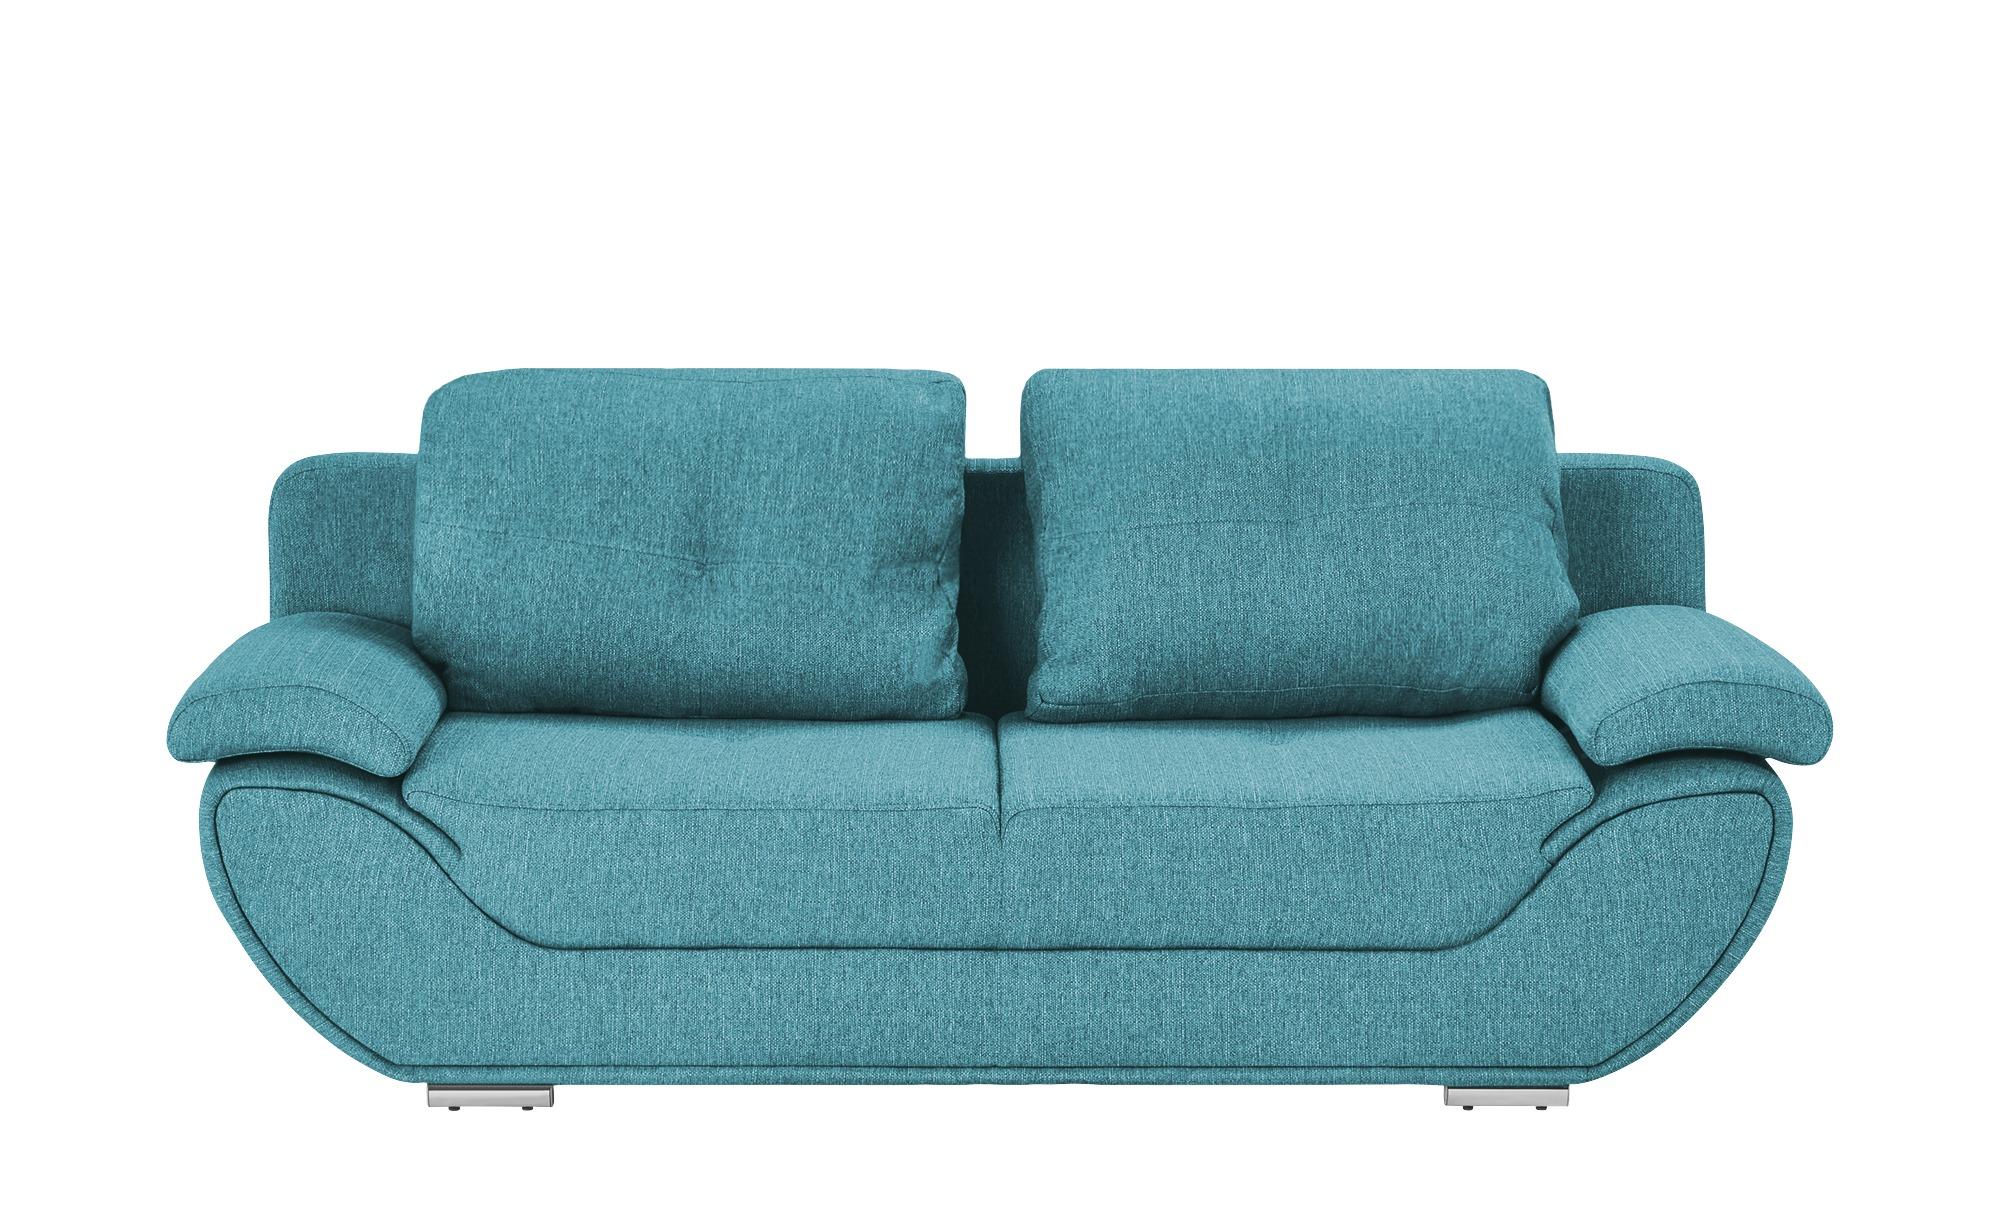 smart Design-Schlafsofa petrol - Webstoff Adina ¦ türkis/petrol ¦ Maße (cm): B: 204 H: 90 T: 92 Polstermöbel > Sofas > 2-Sitzer - Höffner